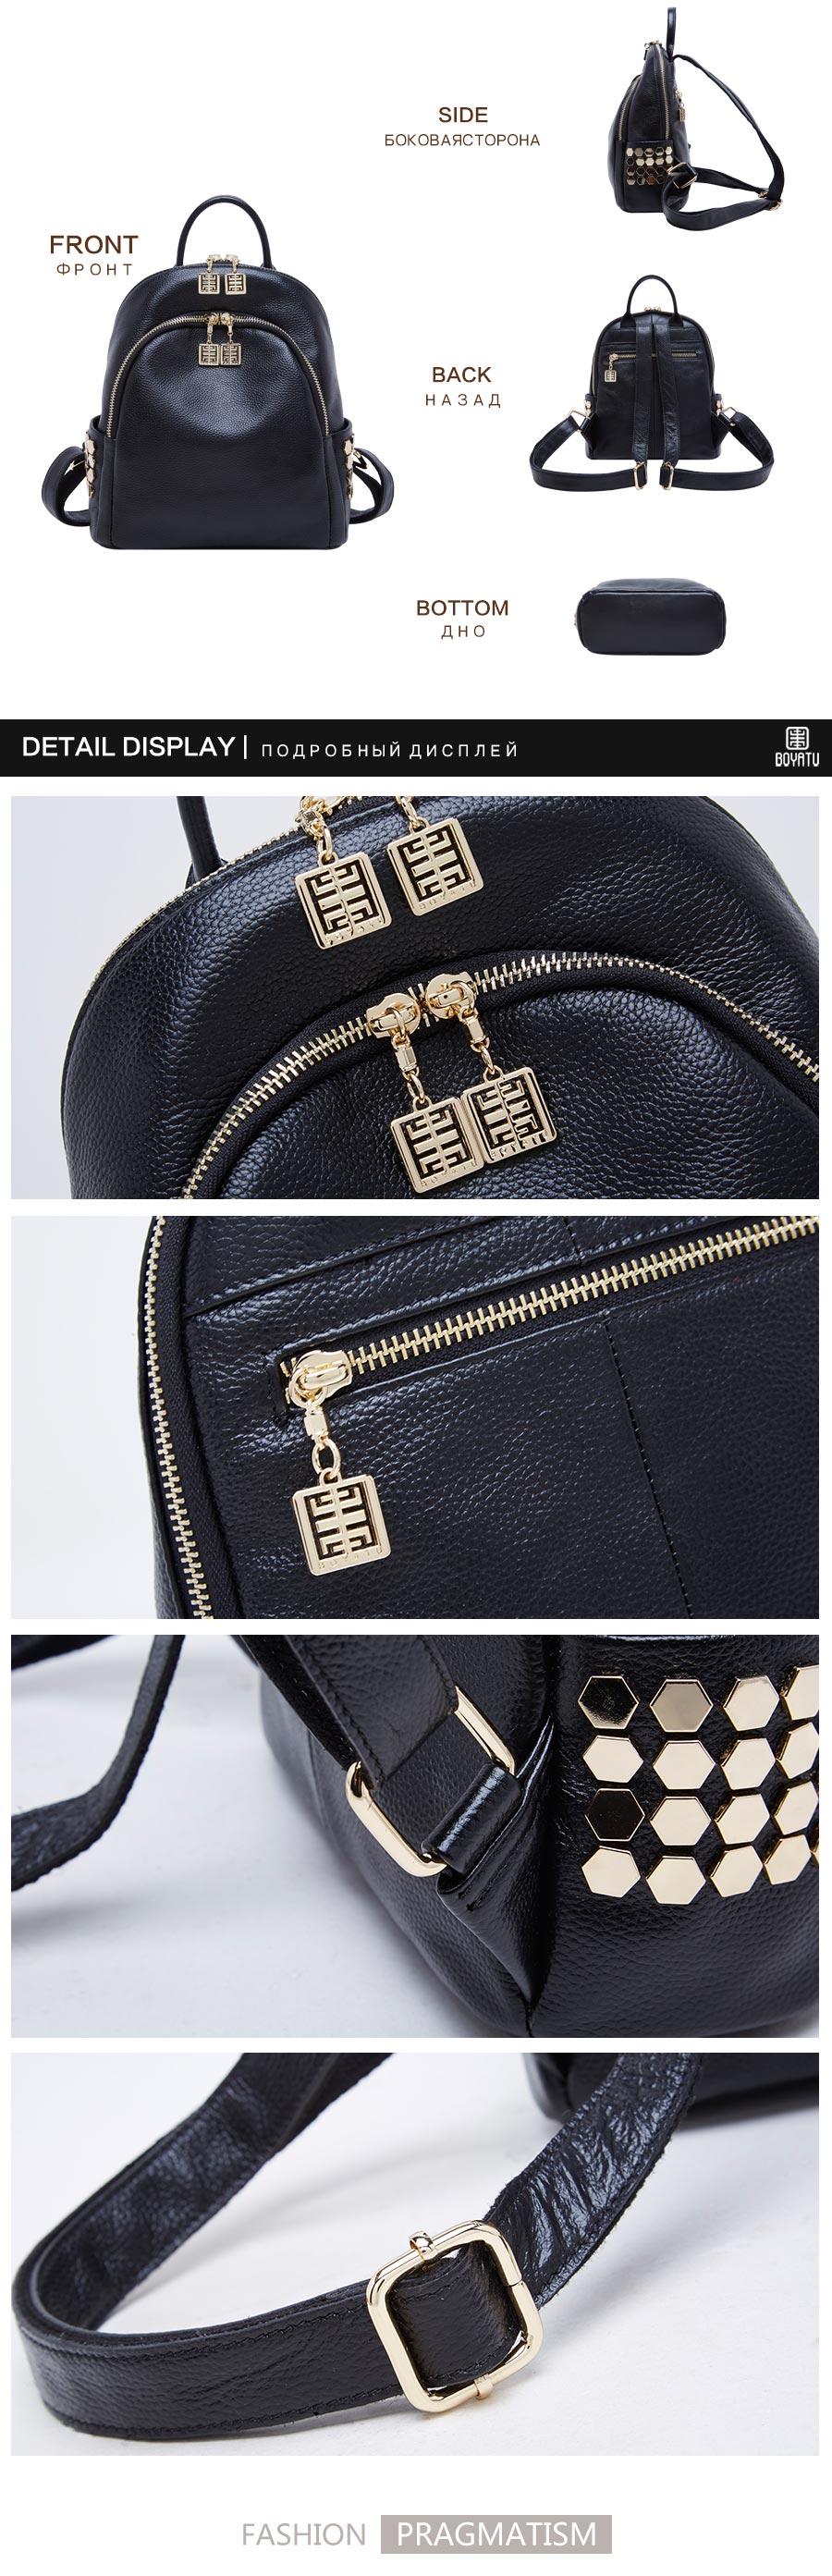 71801_03 BOYATU Designer Backpack Super Zipper Luxury Genuine Leather Backpack Women 2017 Original Muchila Obag Sack Mochila Feminina